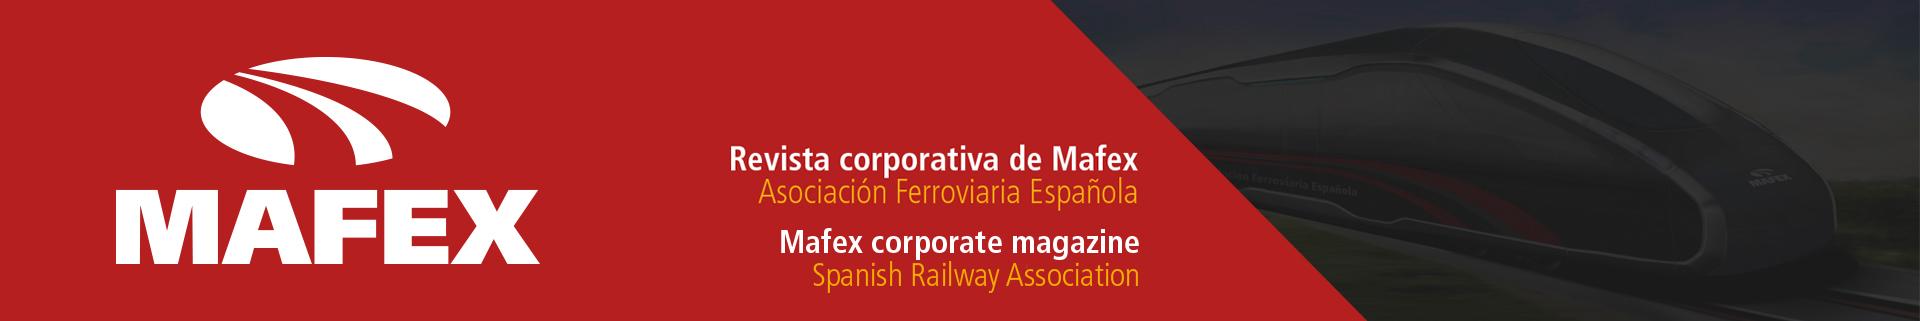 Mafex Magazine